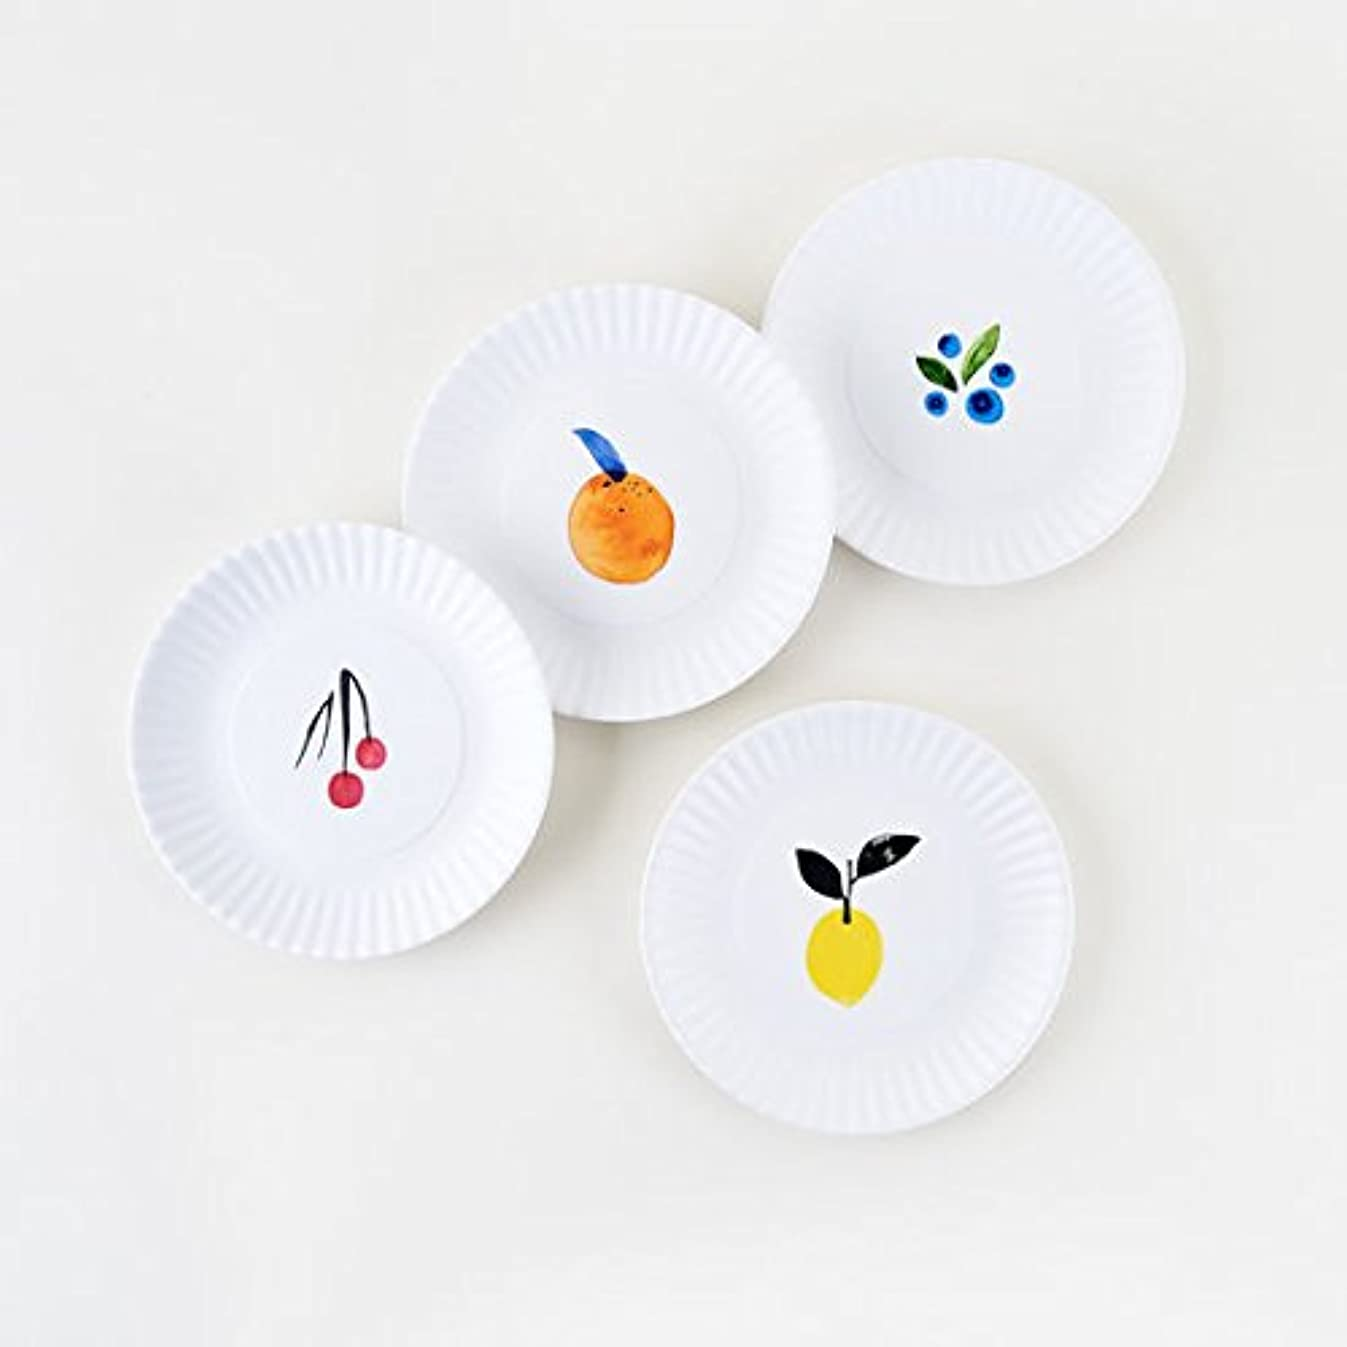 Fruit Plates Designed by Misha Zadeh - 7.5 inch Melamine